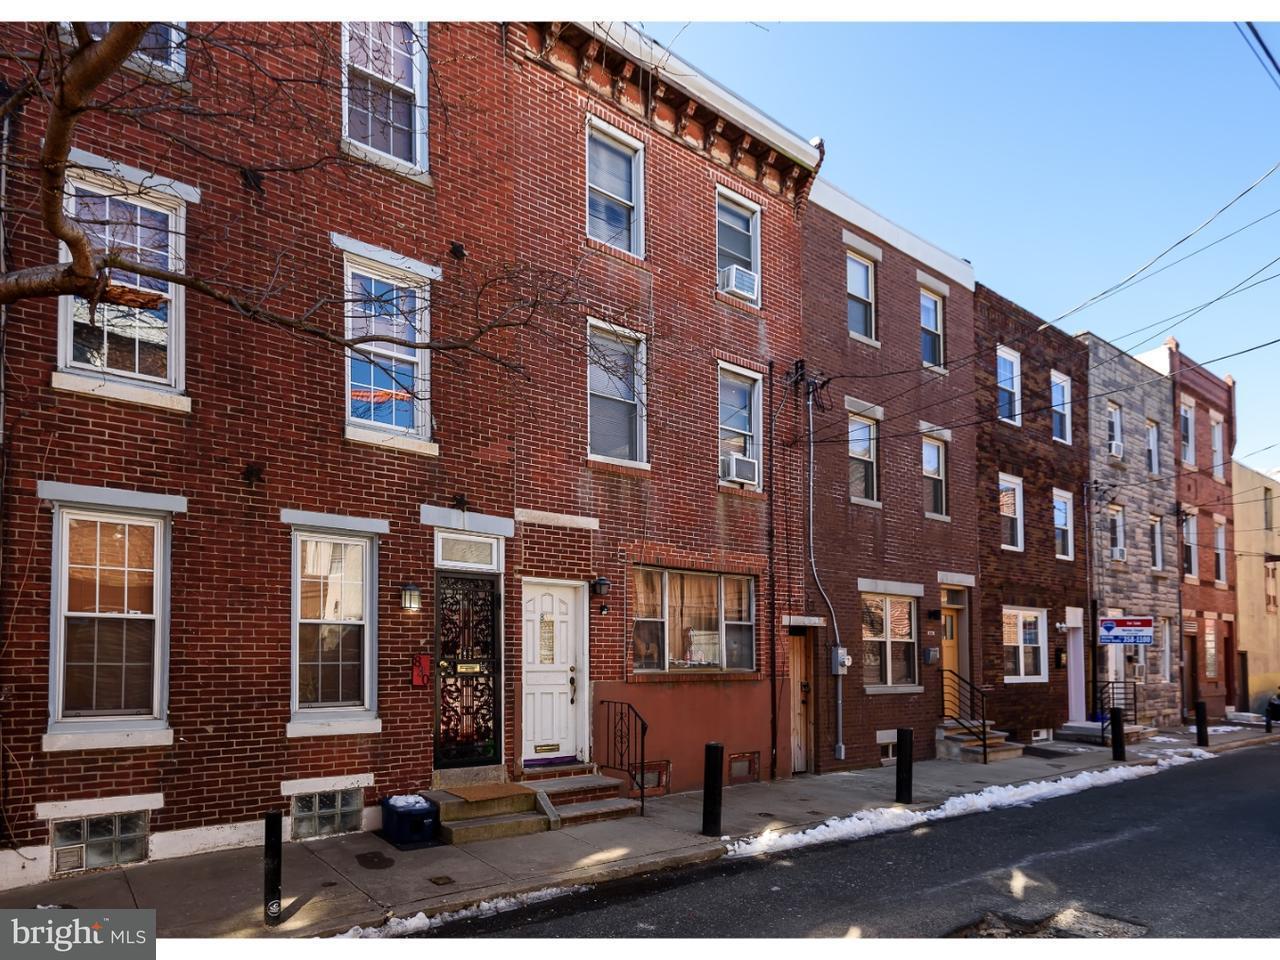 832 League Street Philadelphia, PA 19147